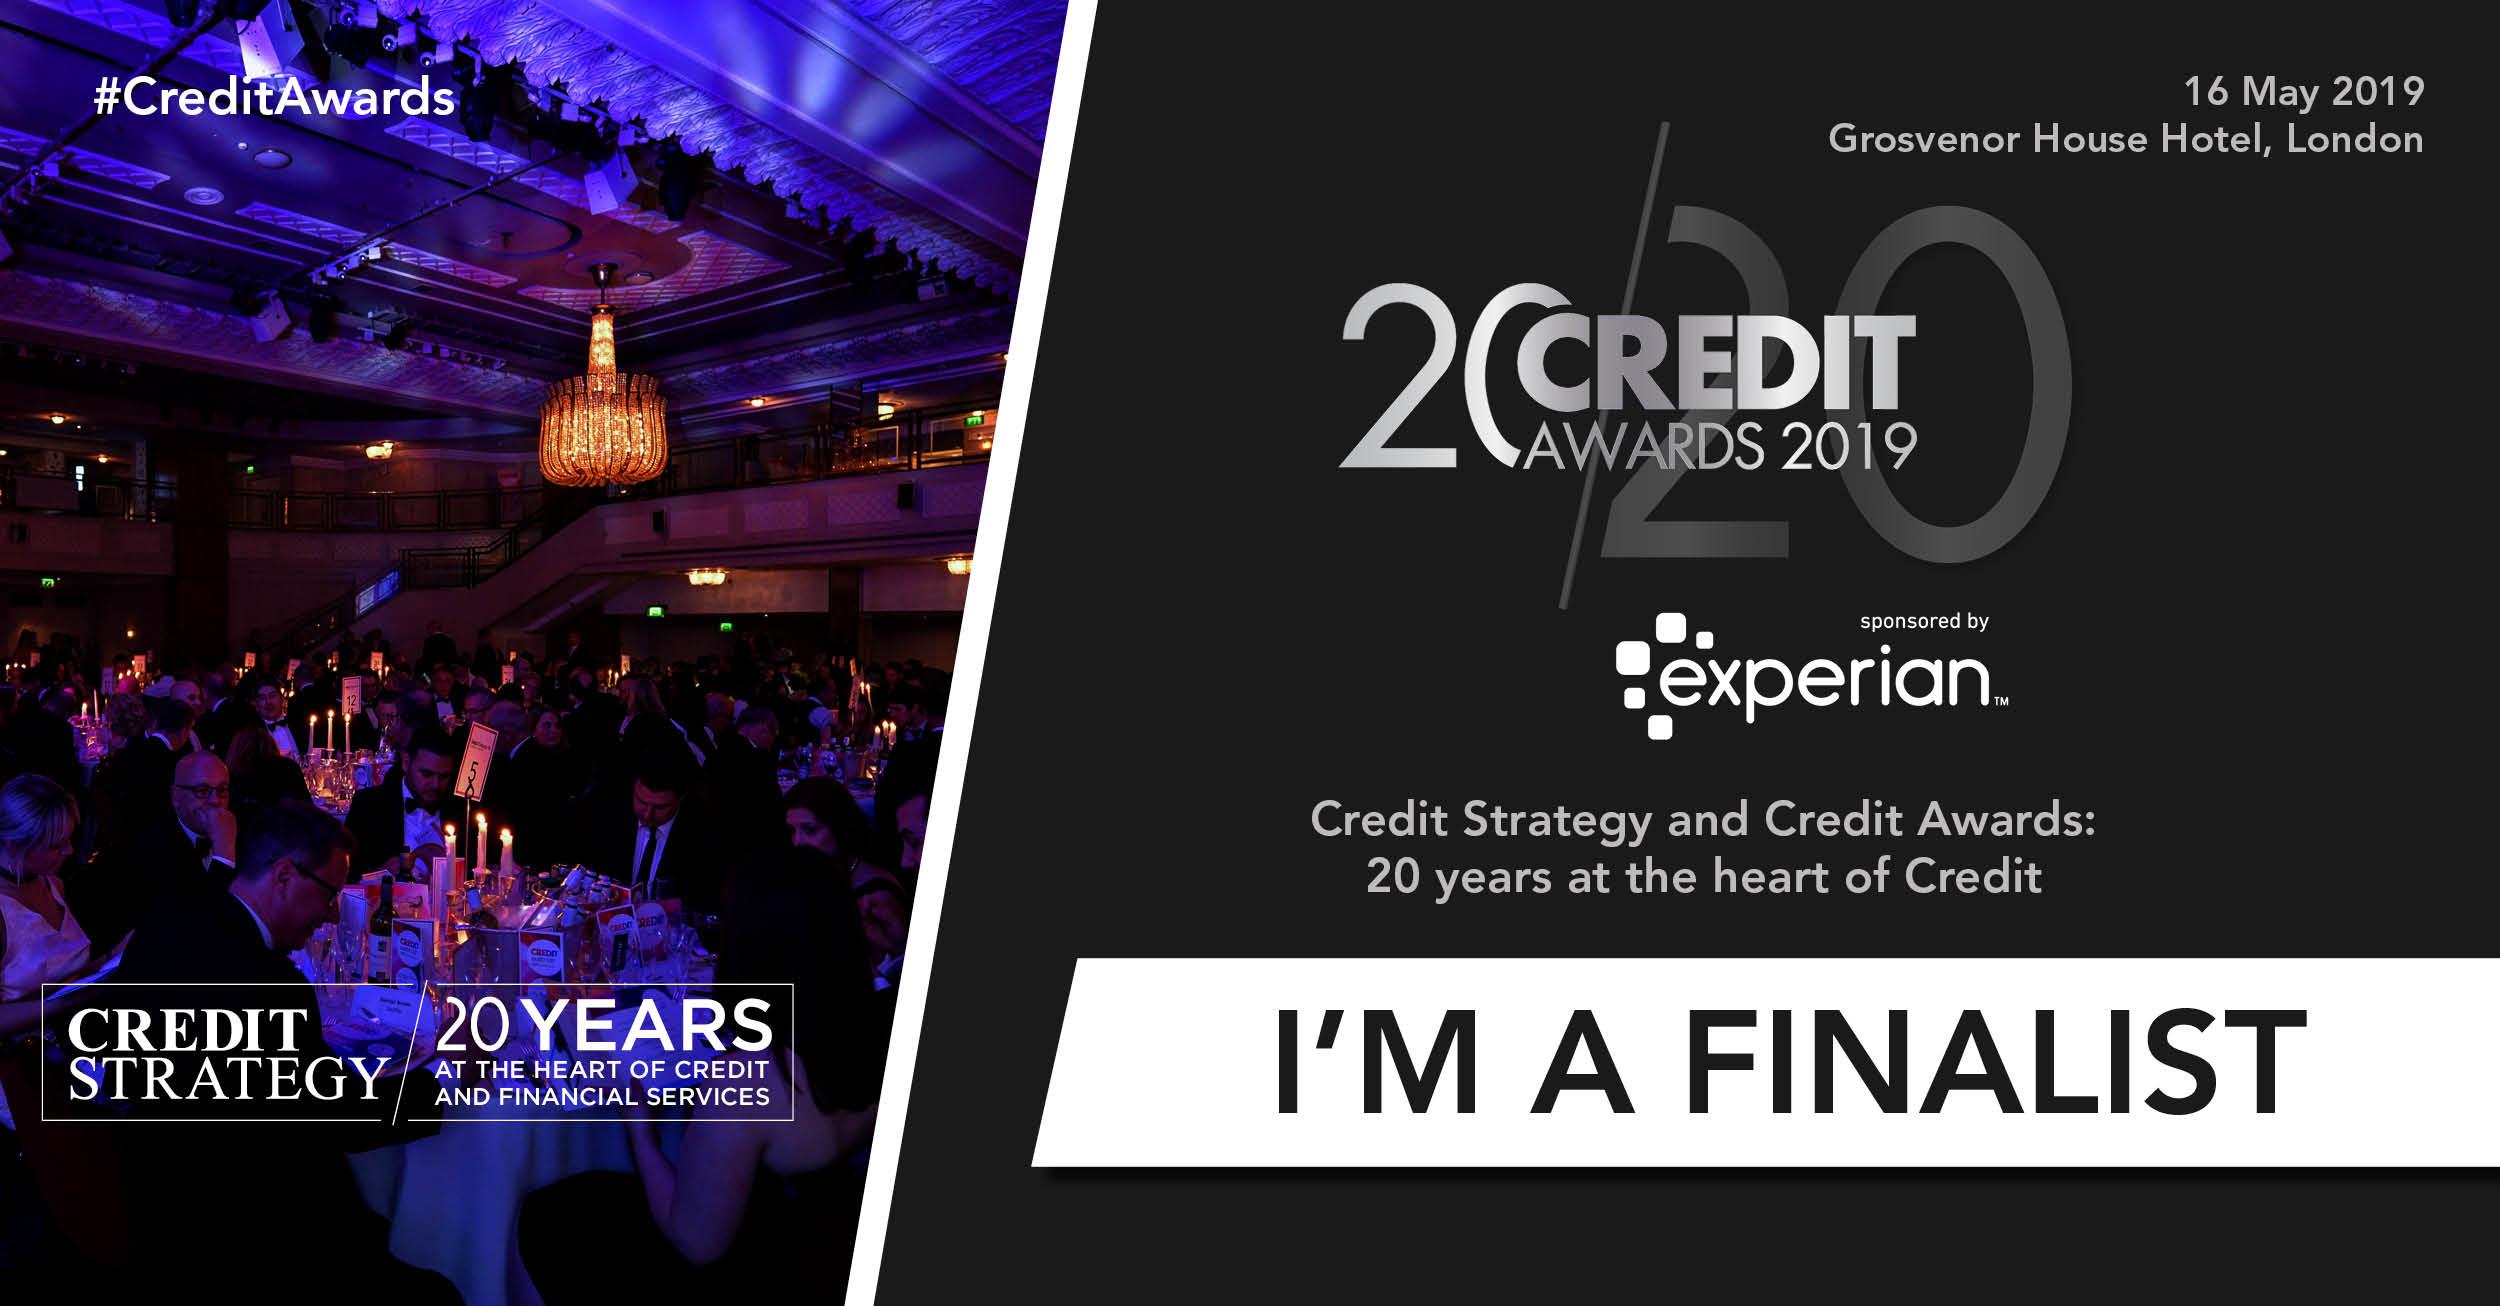 Credit_Awards18_Iamfinalist.jpg